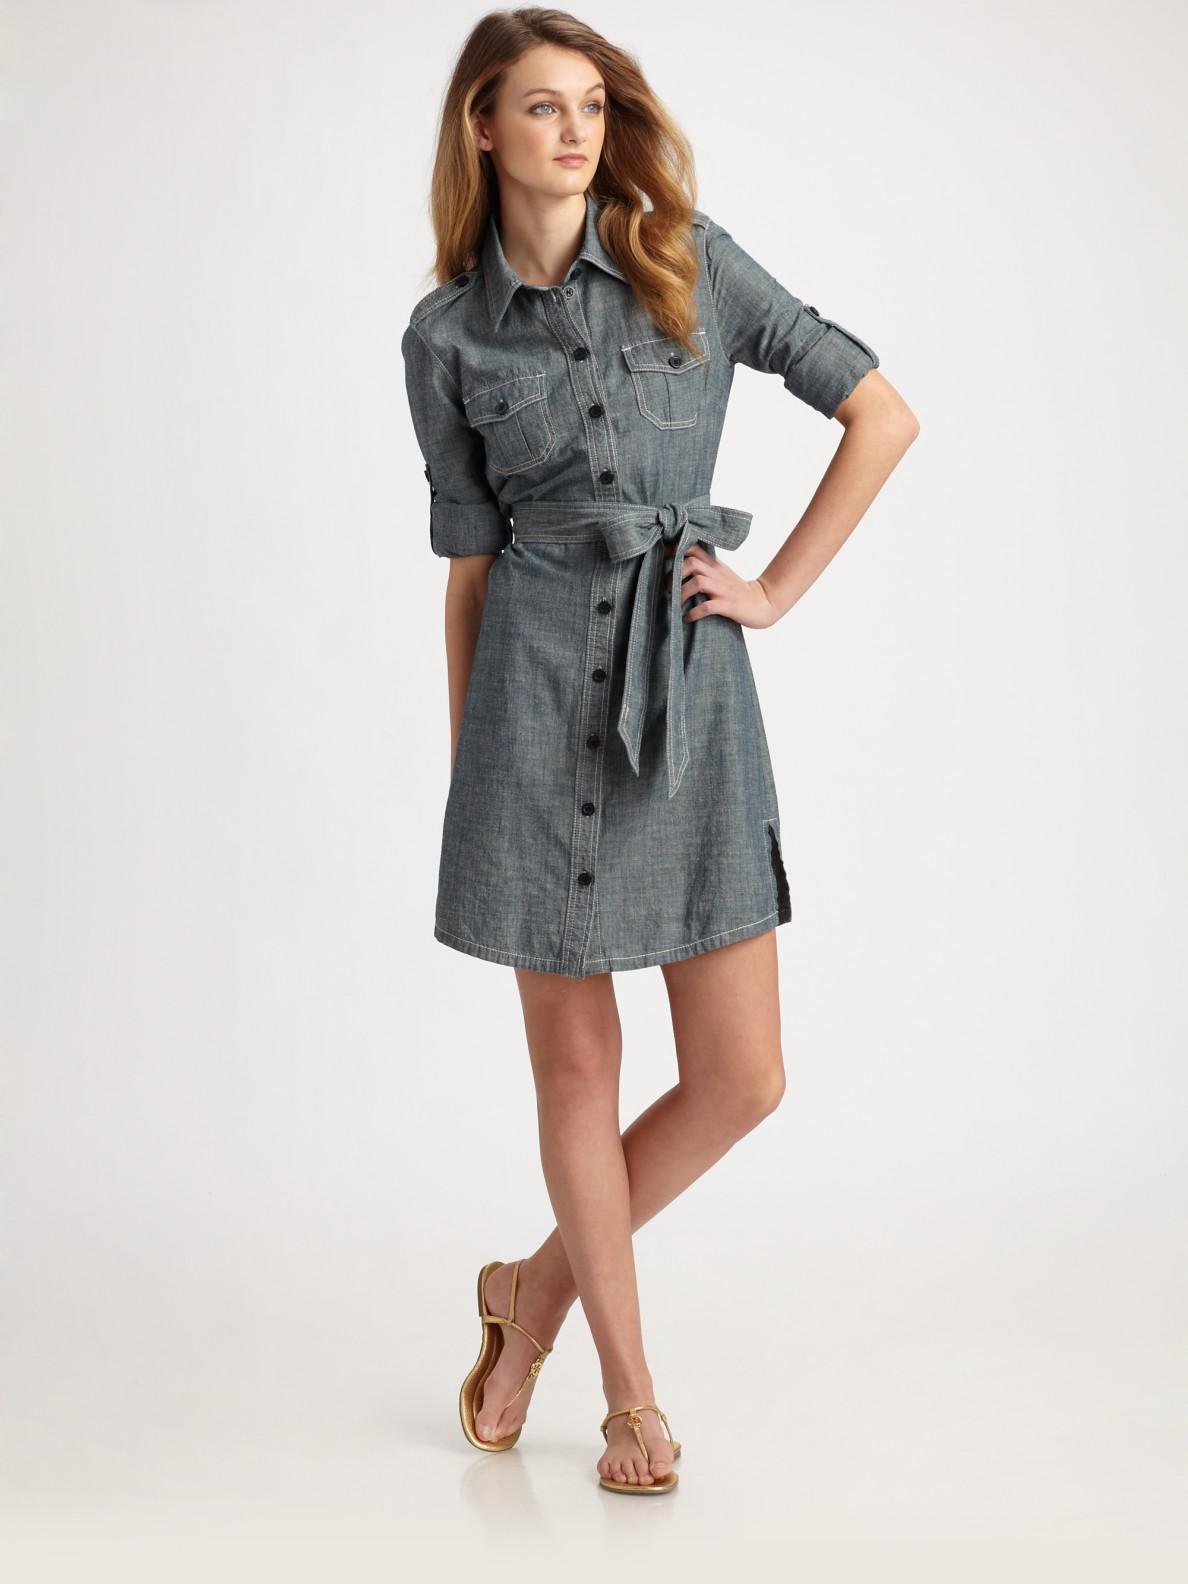 Tory Burch Brigitte Chambray Shirt Dress In Gray Lyst